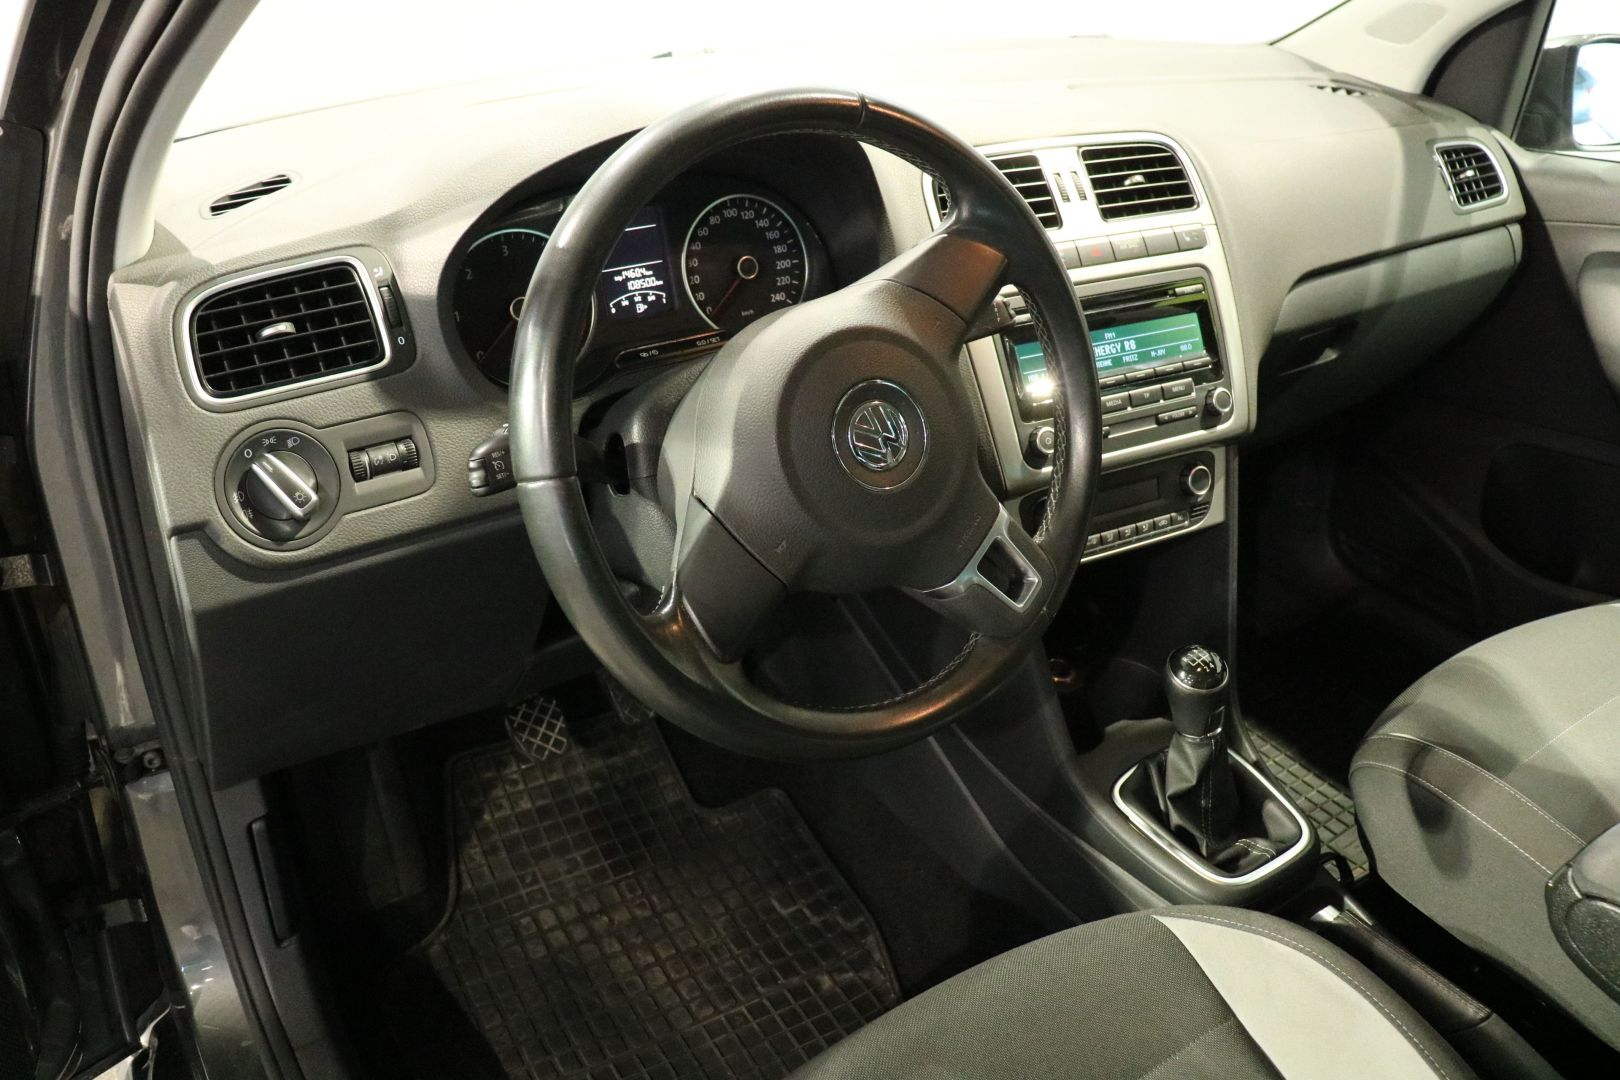 Volkswagen Polo V 1 6 TDI 90ch Life 5p